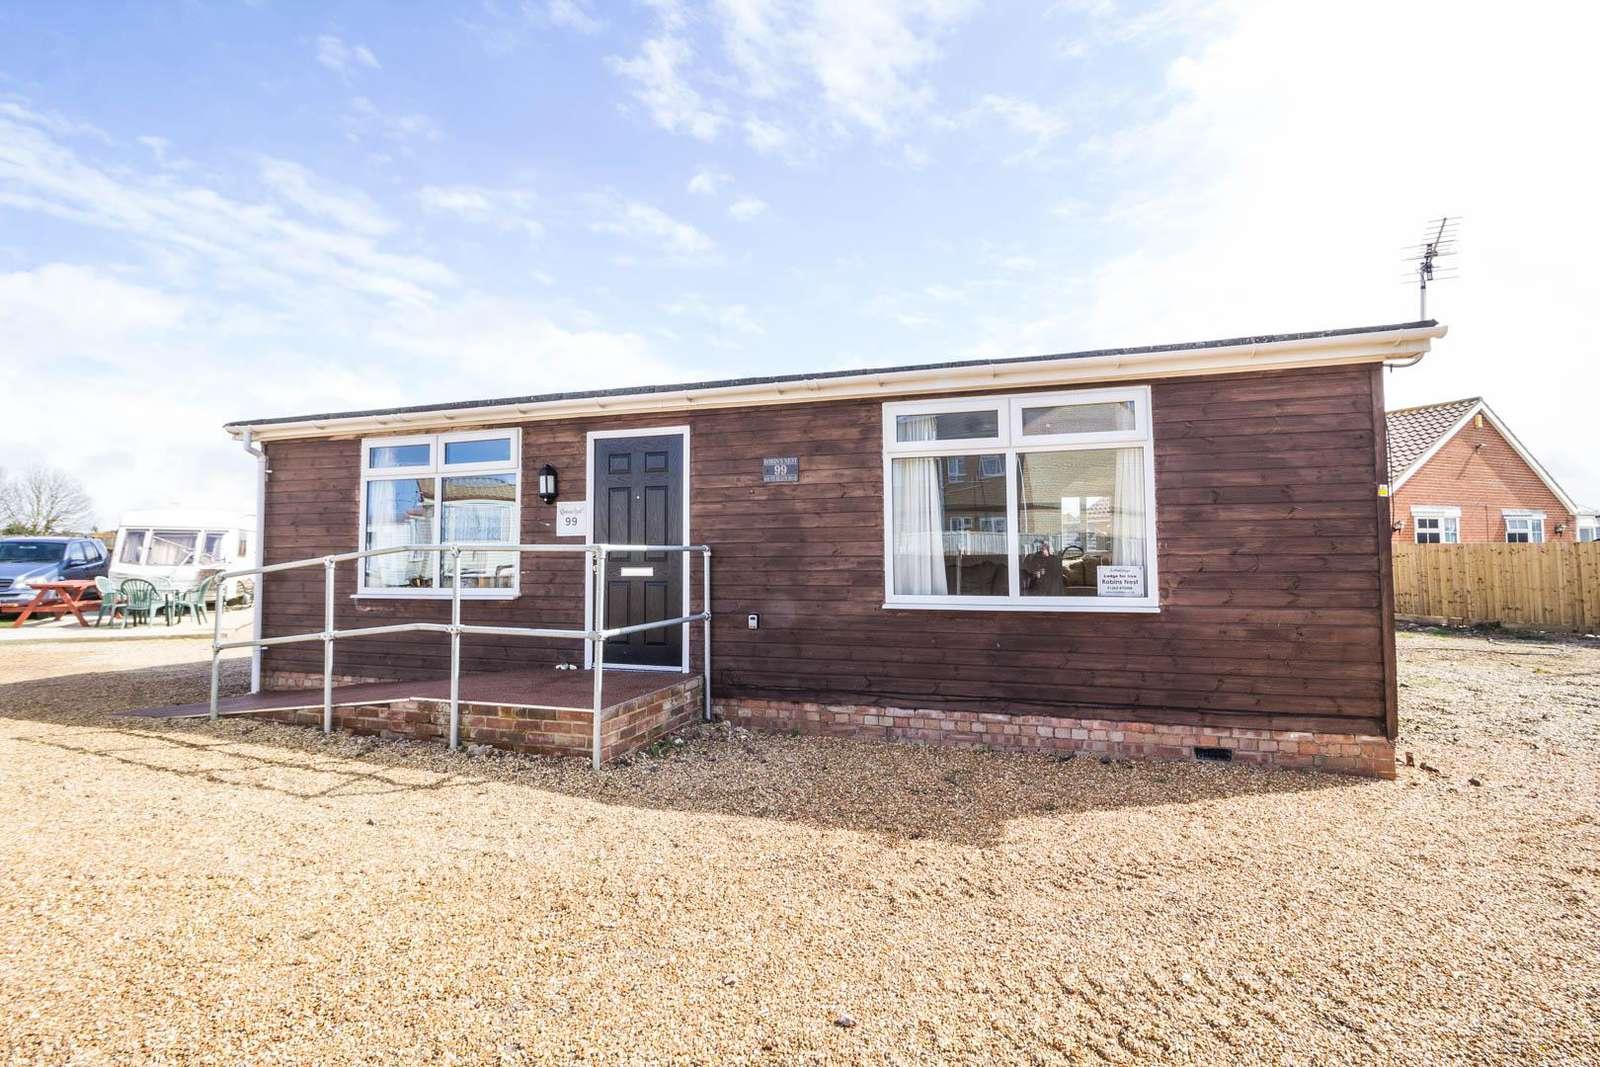 13015RN – Robins Nest Lodge, 2 bed, 5 berth lodge. Diamond rated - property